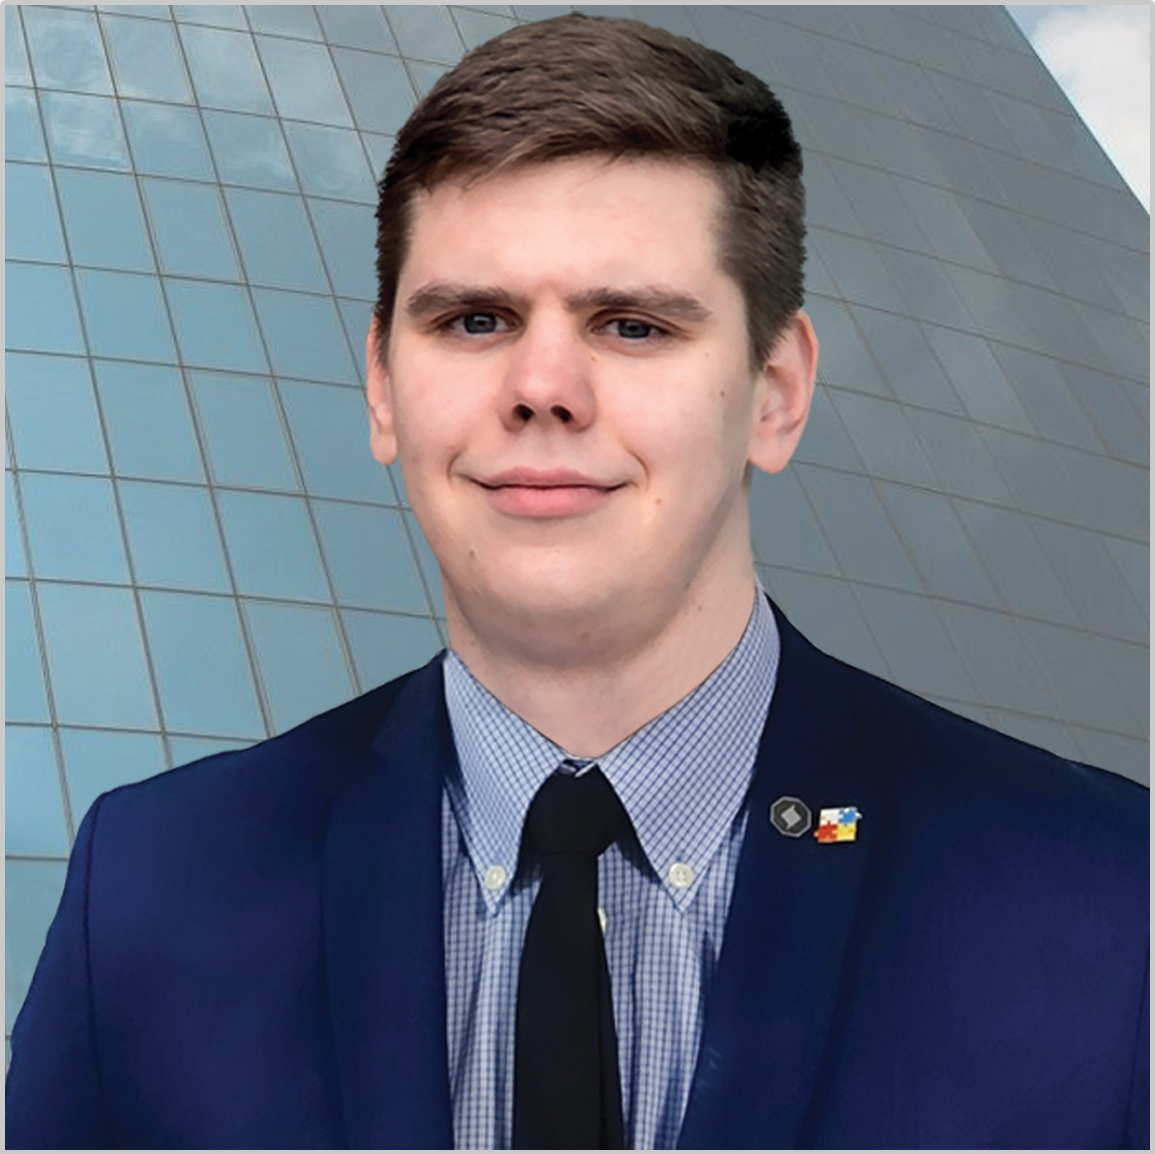 Oleksandr Bondarenko